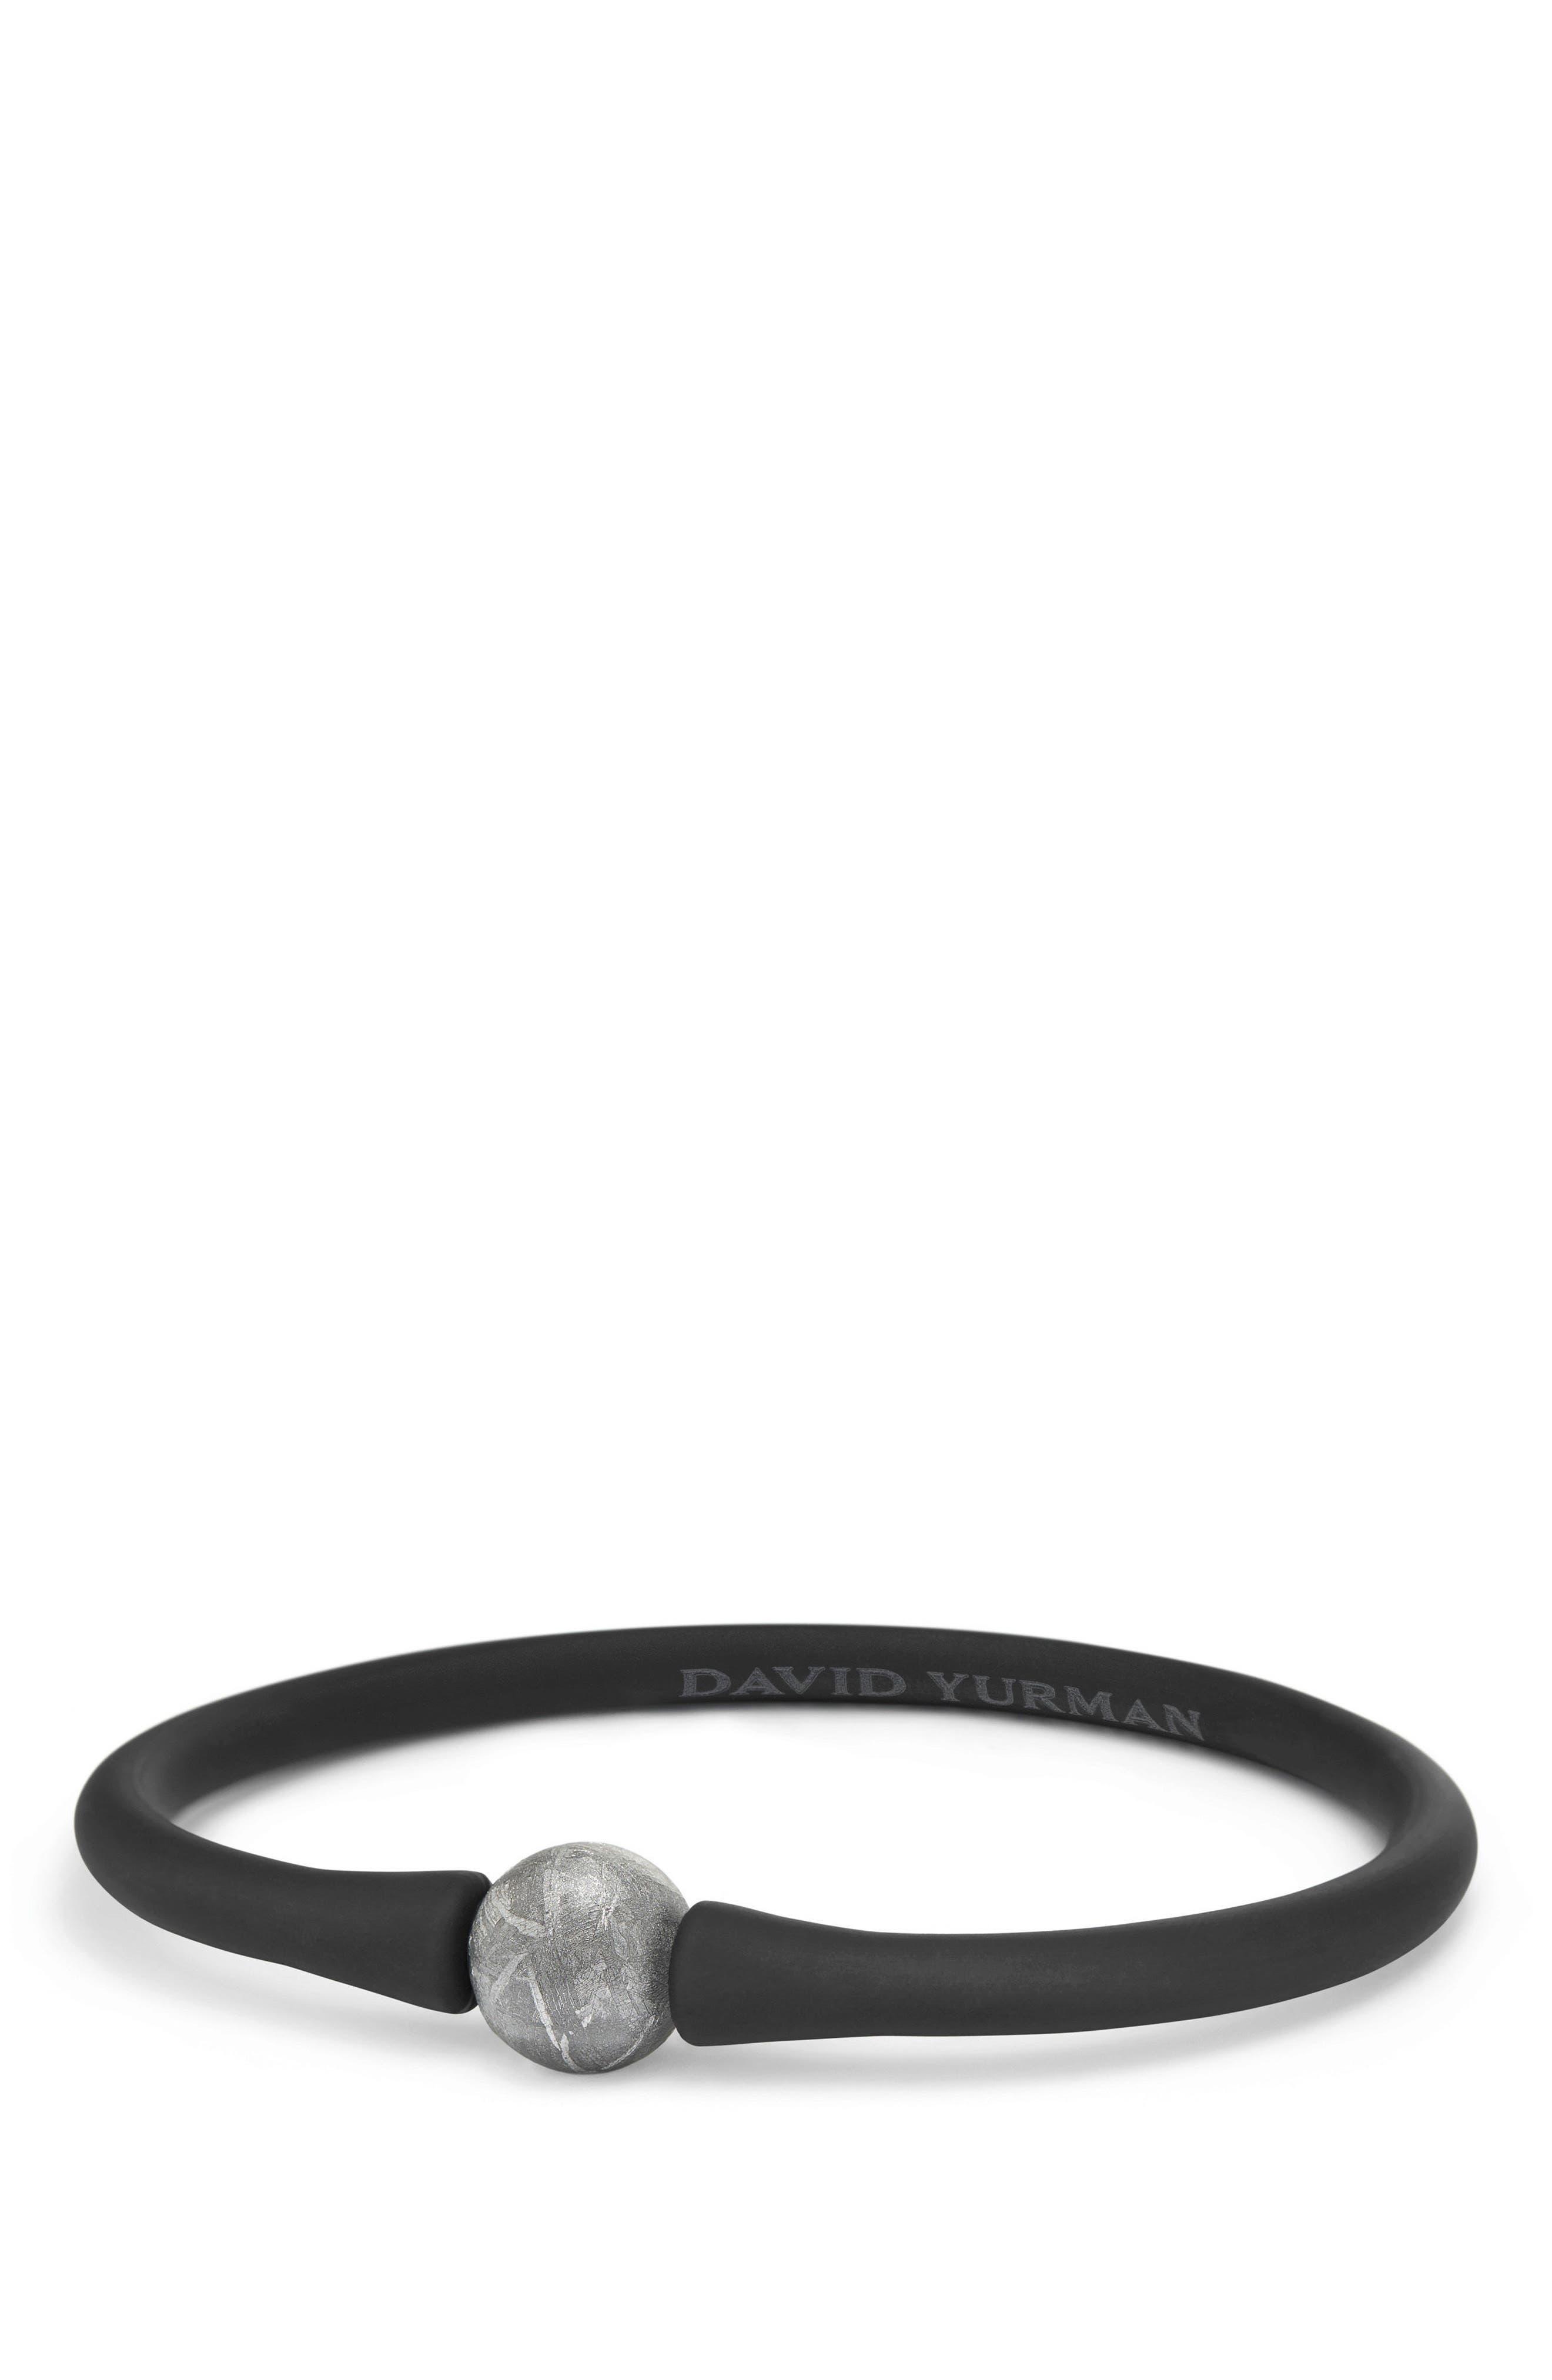 Spiritual Beads Stone Rubber Bead Bracelet,                             Main thumbnail 1, color,                             Meteorite